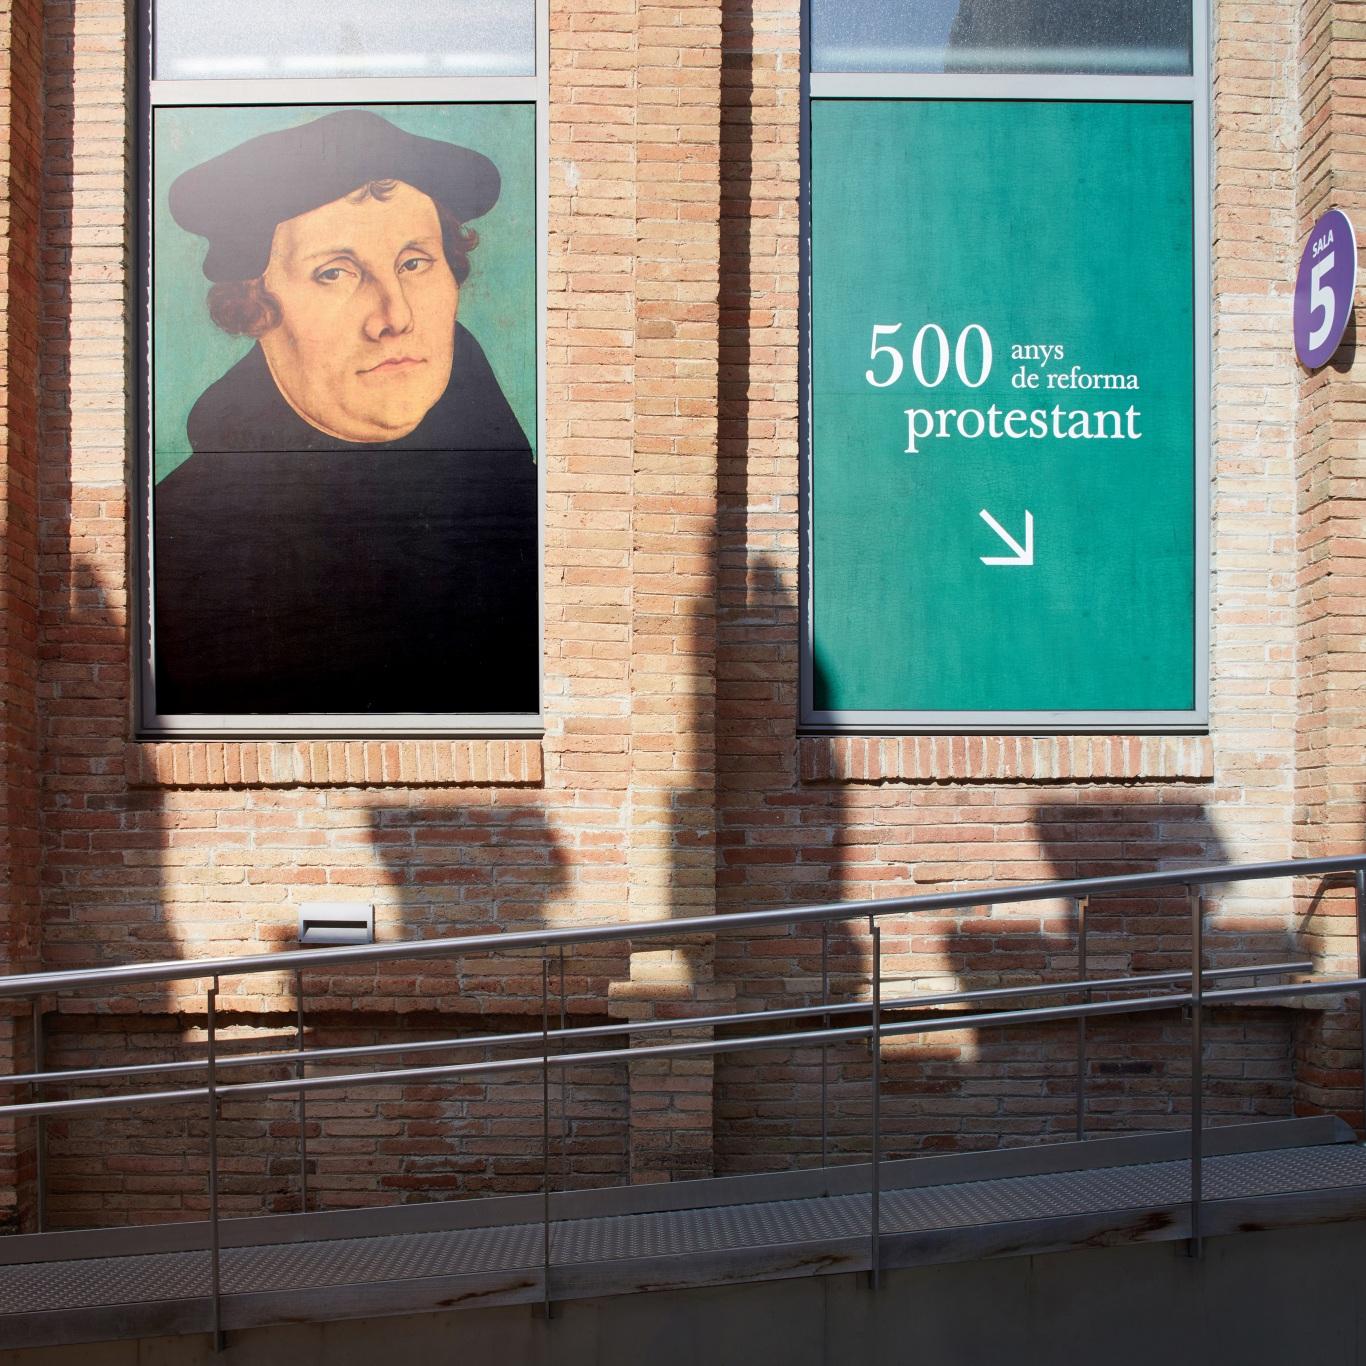 Exposición protestantes Caixaforum. Fachada Caixaforum. Carteles de la exposición con la imagen de Martín Lutero.